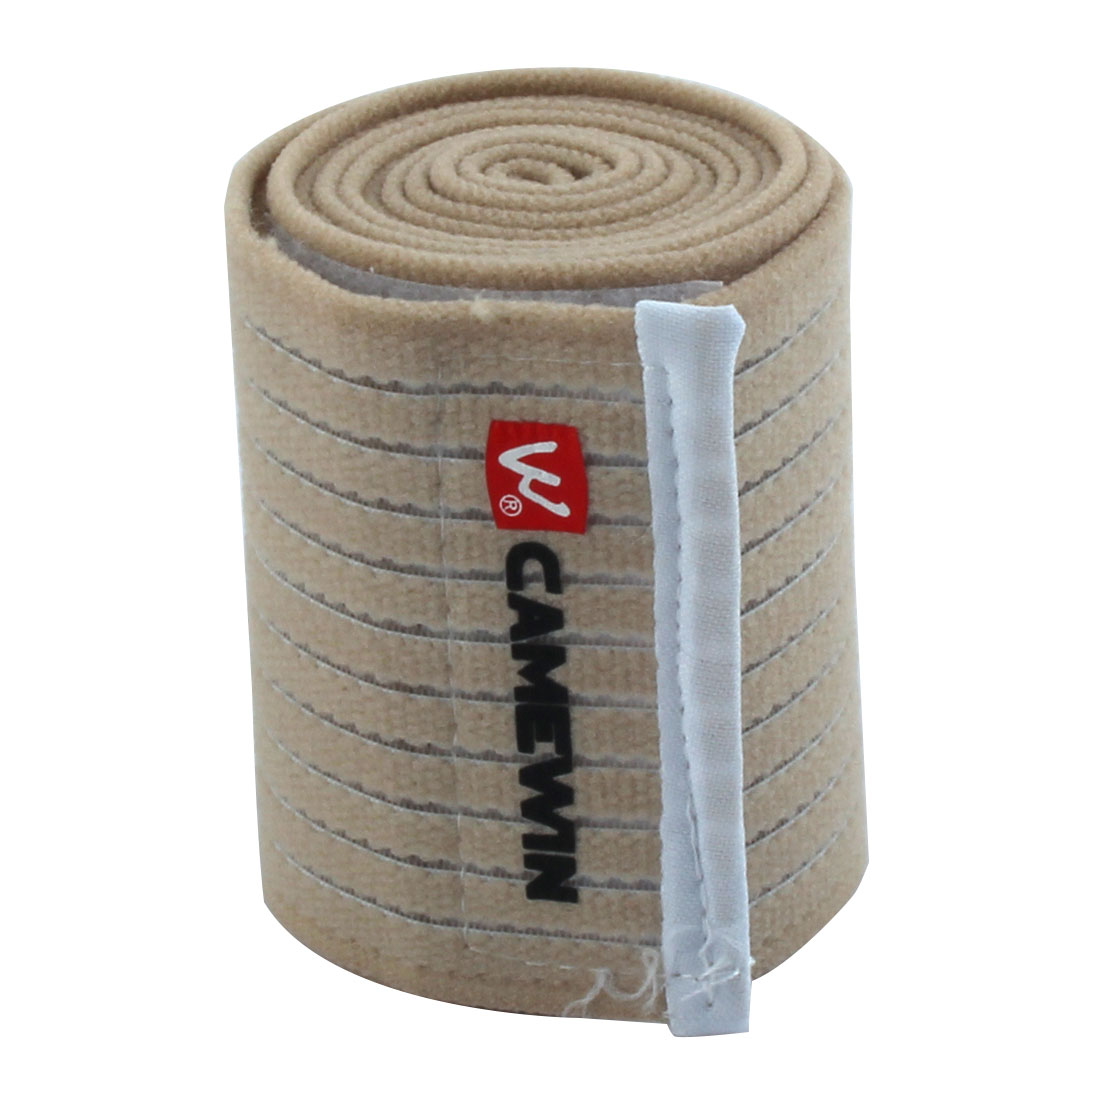 Universal Sports Beige Hook and Loop Fastener Elastic Knee Thigh Support Bandage